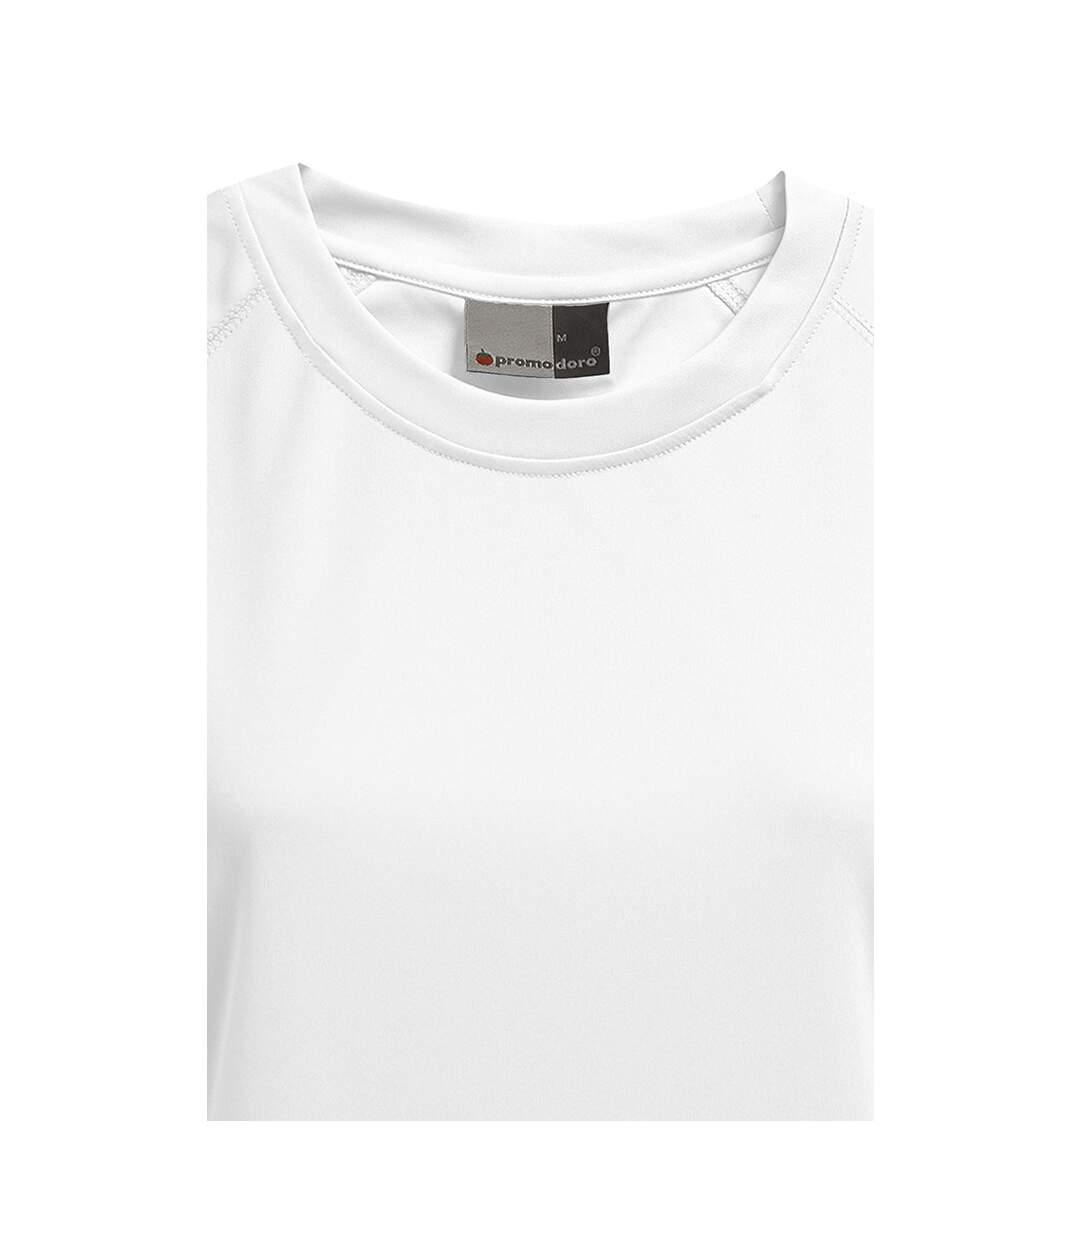 T-shirt sport grandes tailles Femmes